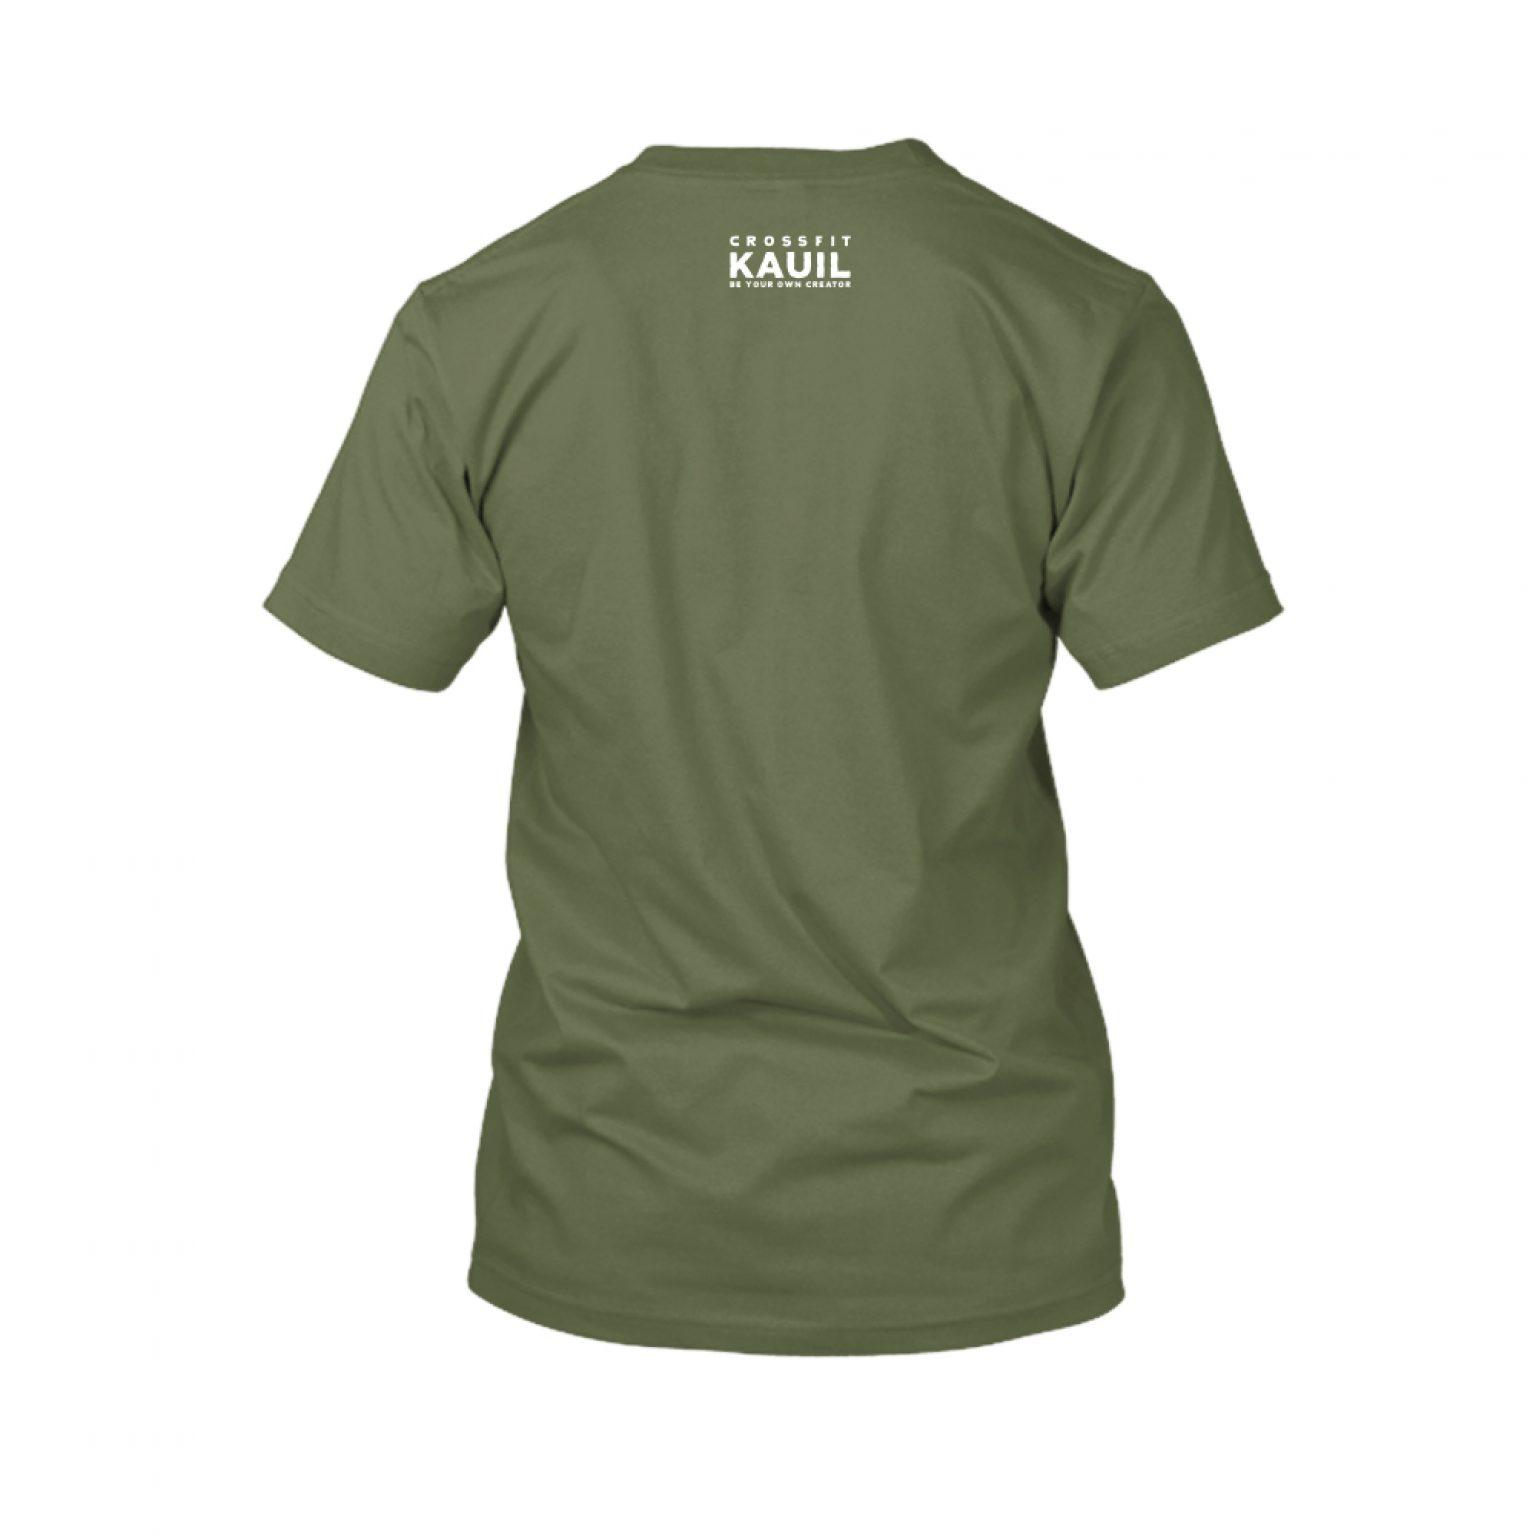 Herren Shirt Army1 weiss back